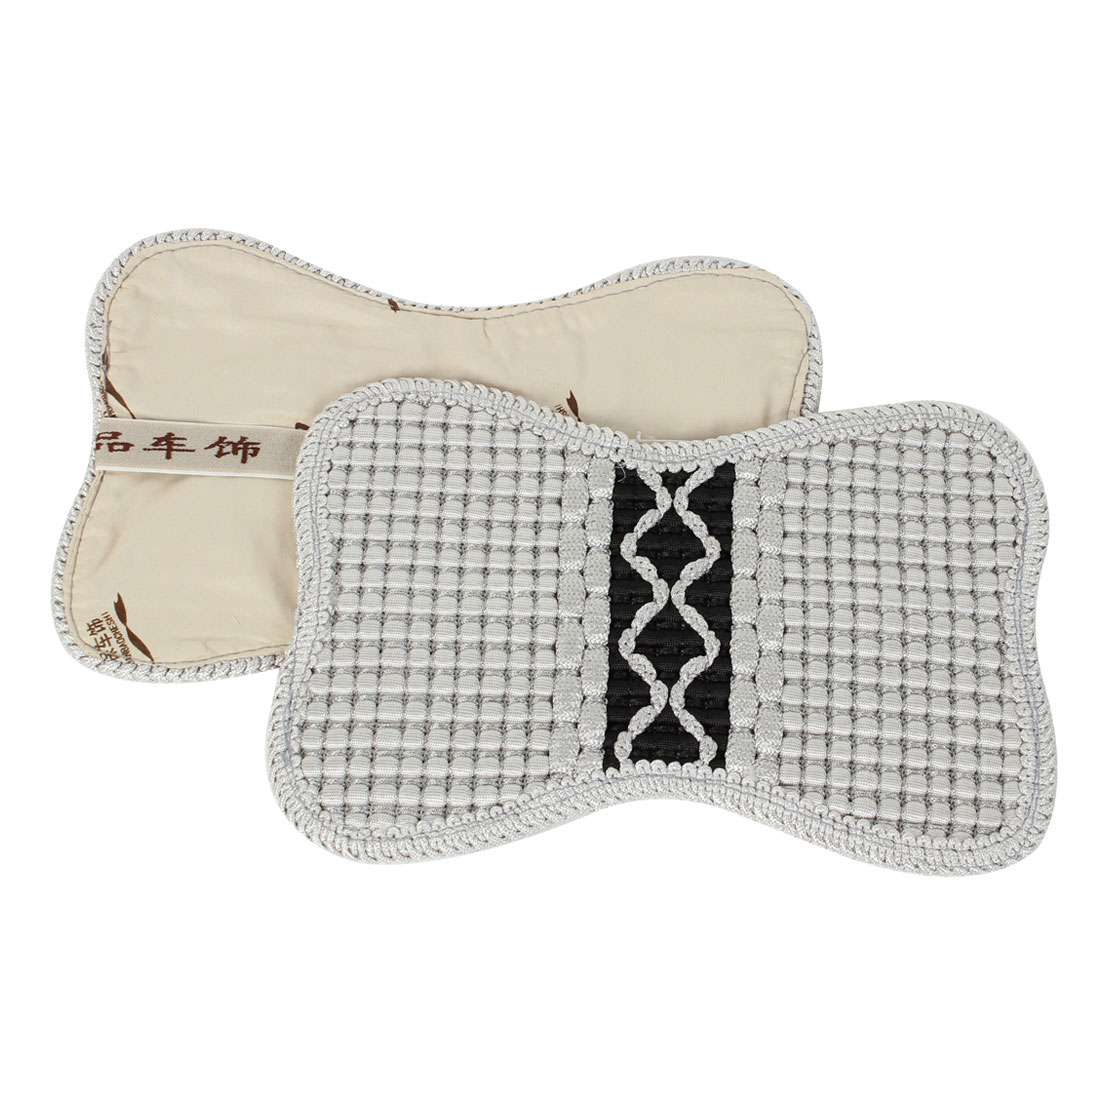 2 x Gray Nylon Fabric Bone Shape Car Auto Neck Rest Pillow Cushion Cover